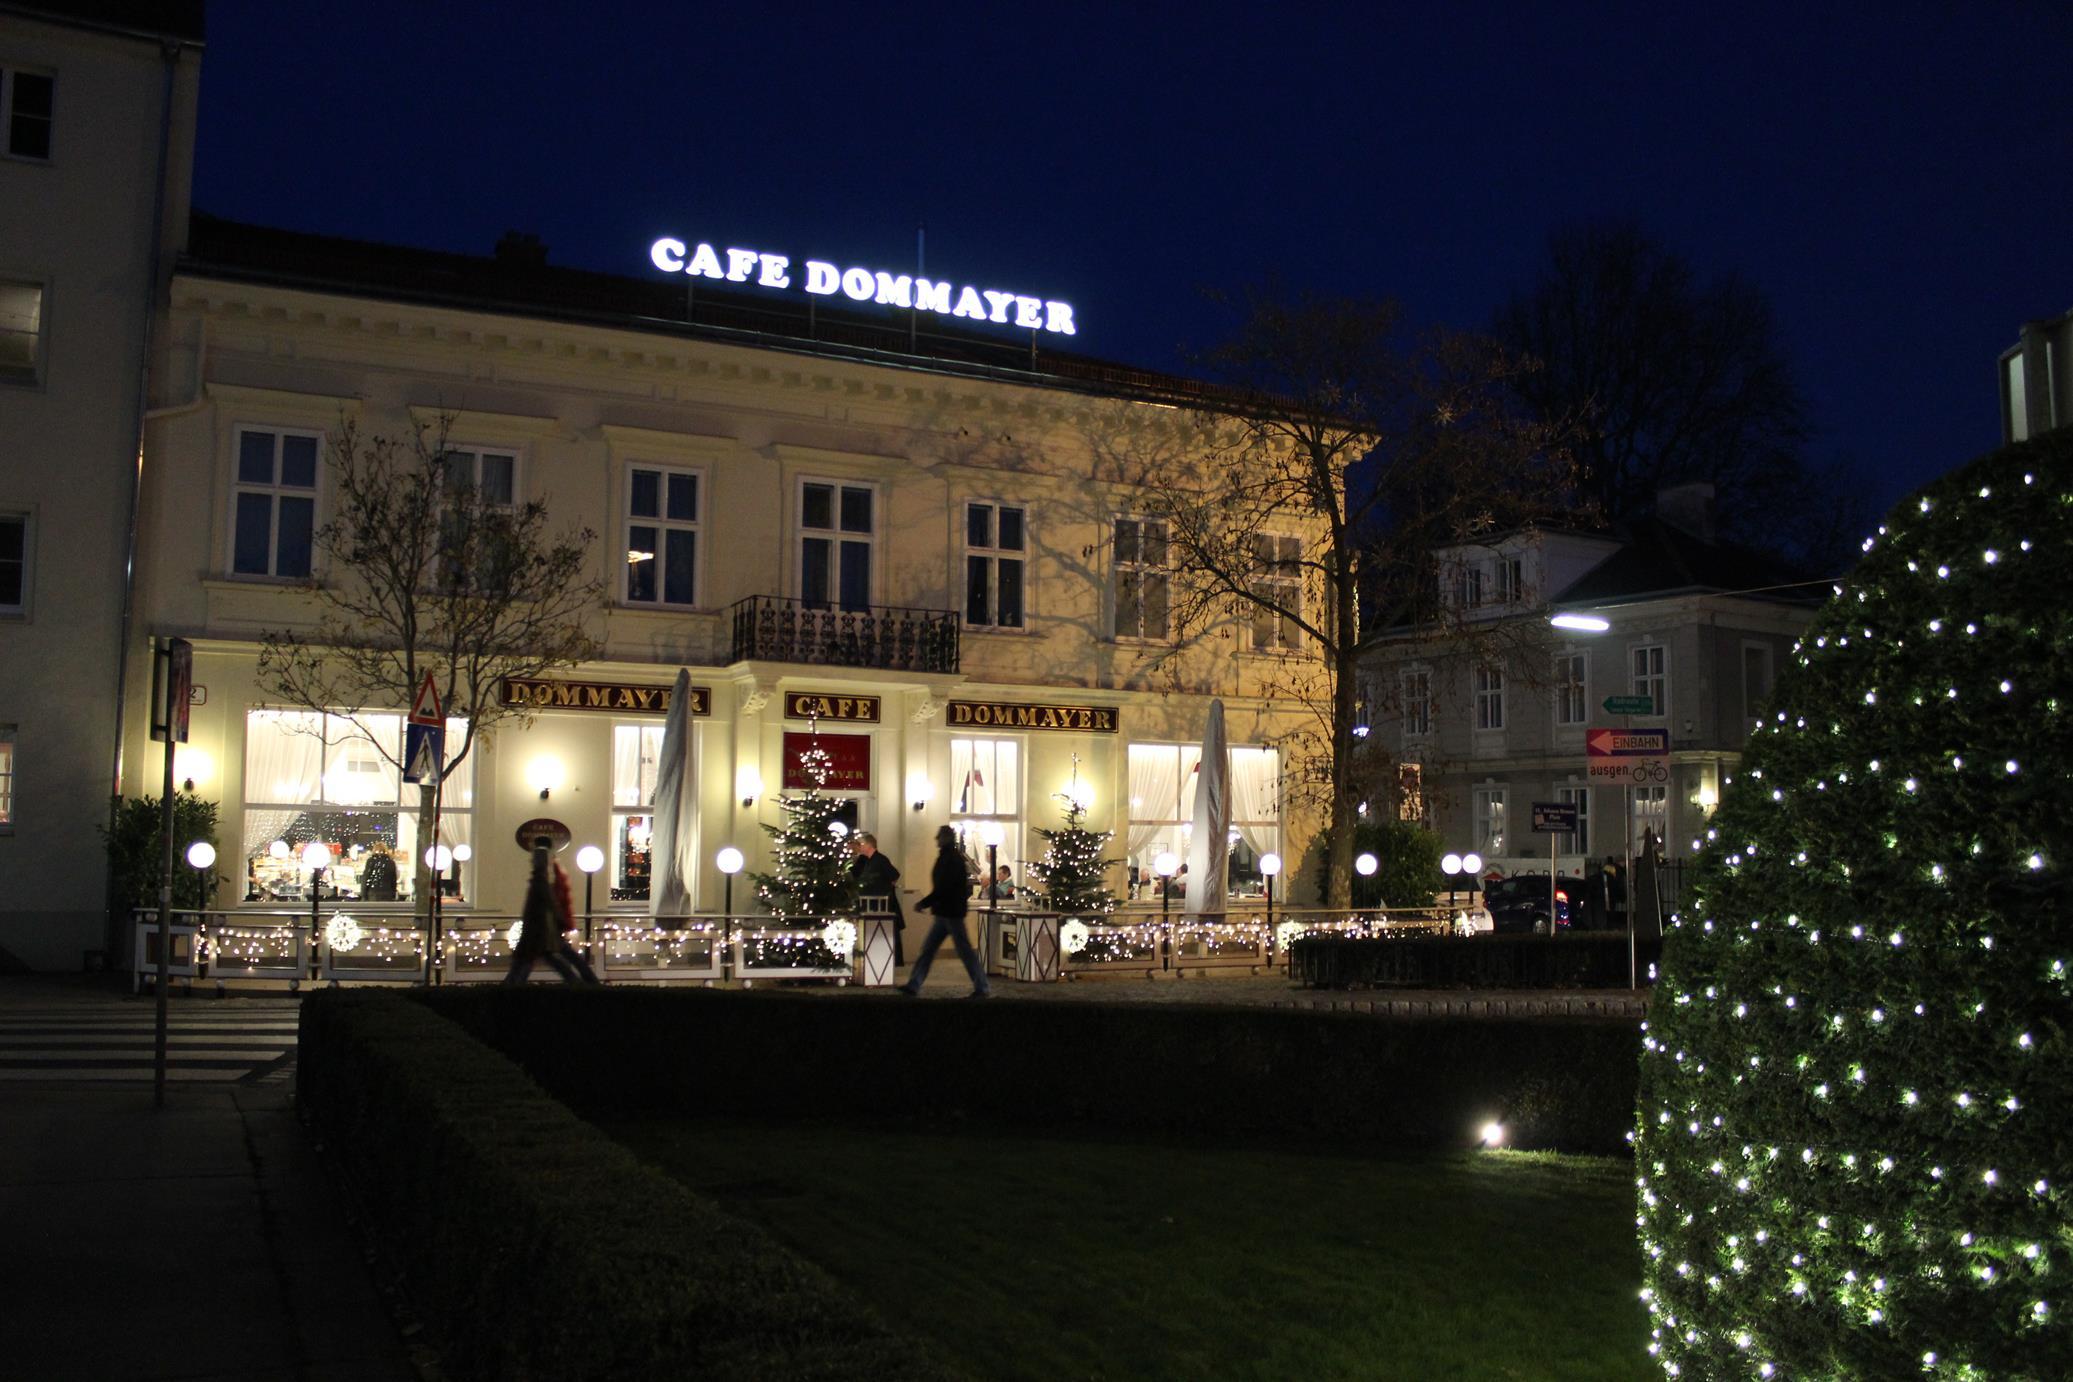 Cafe Dommayer